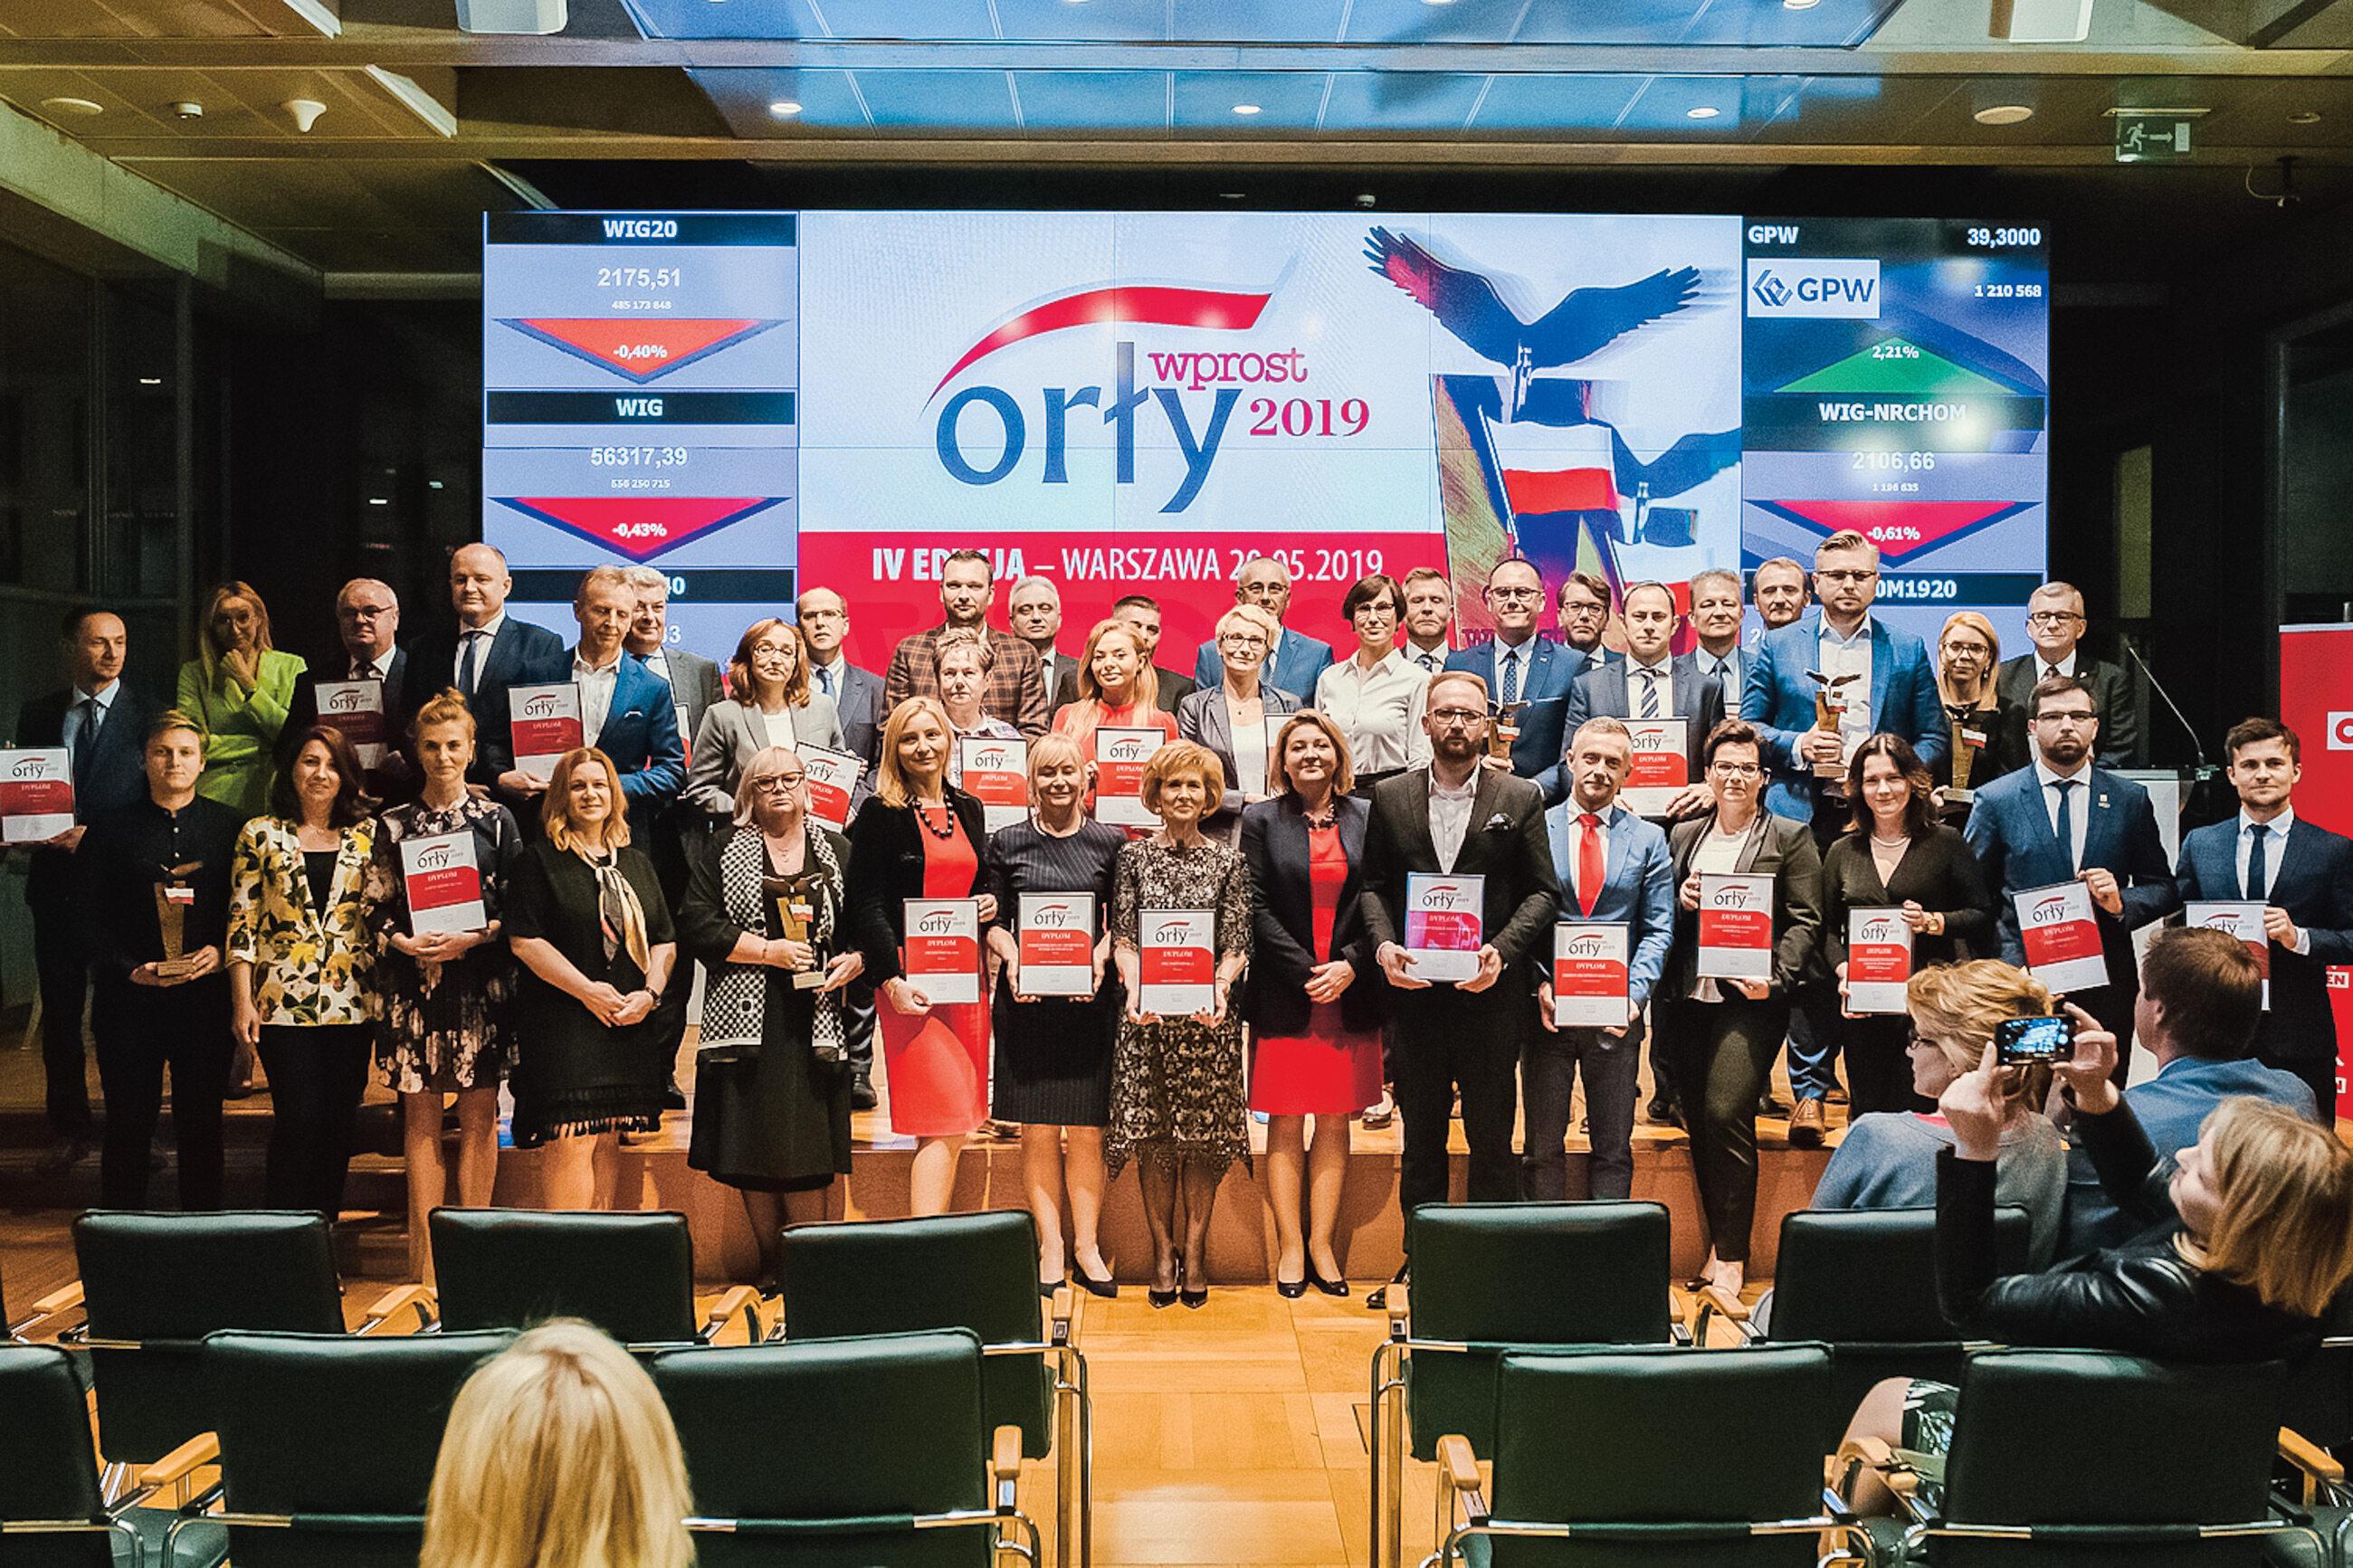 Gala Orły Wprost 2019 - Warszawa